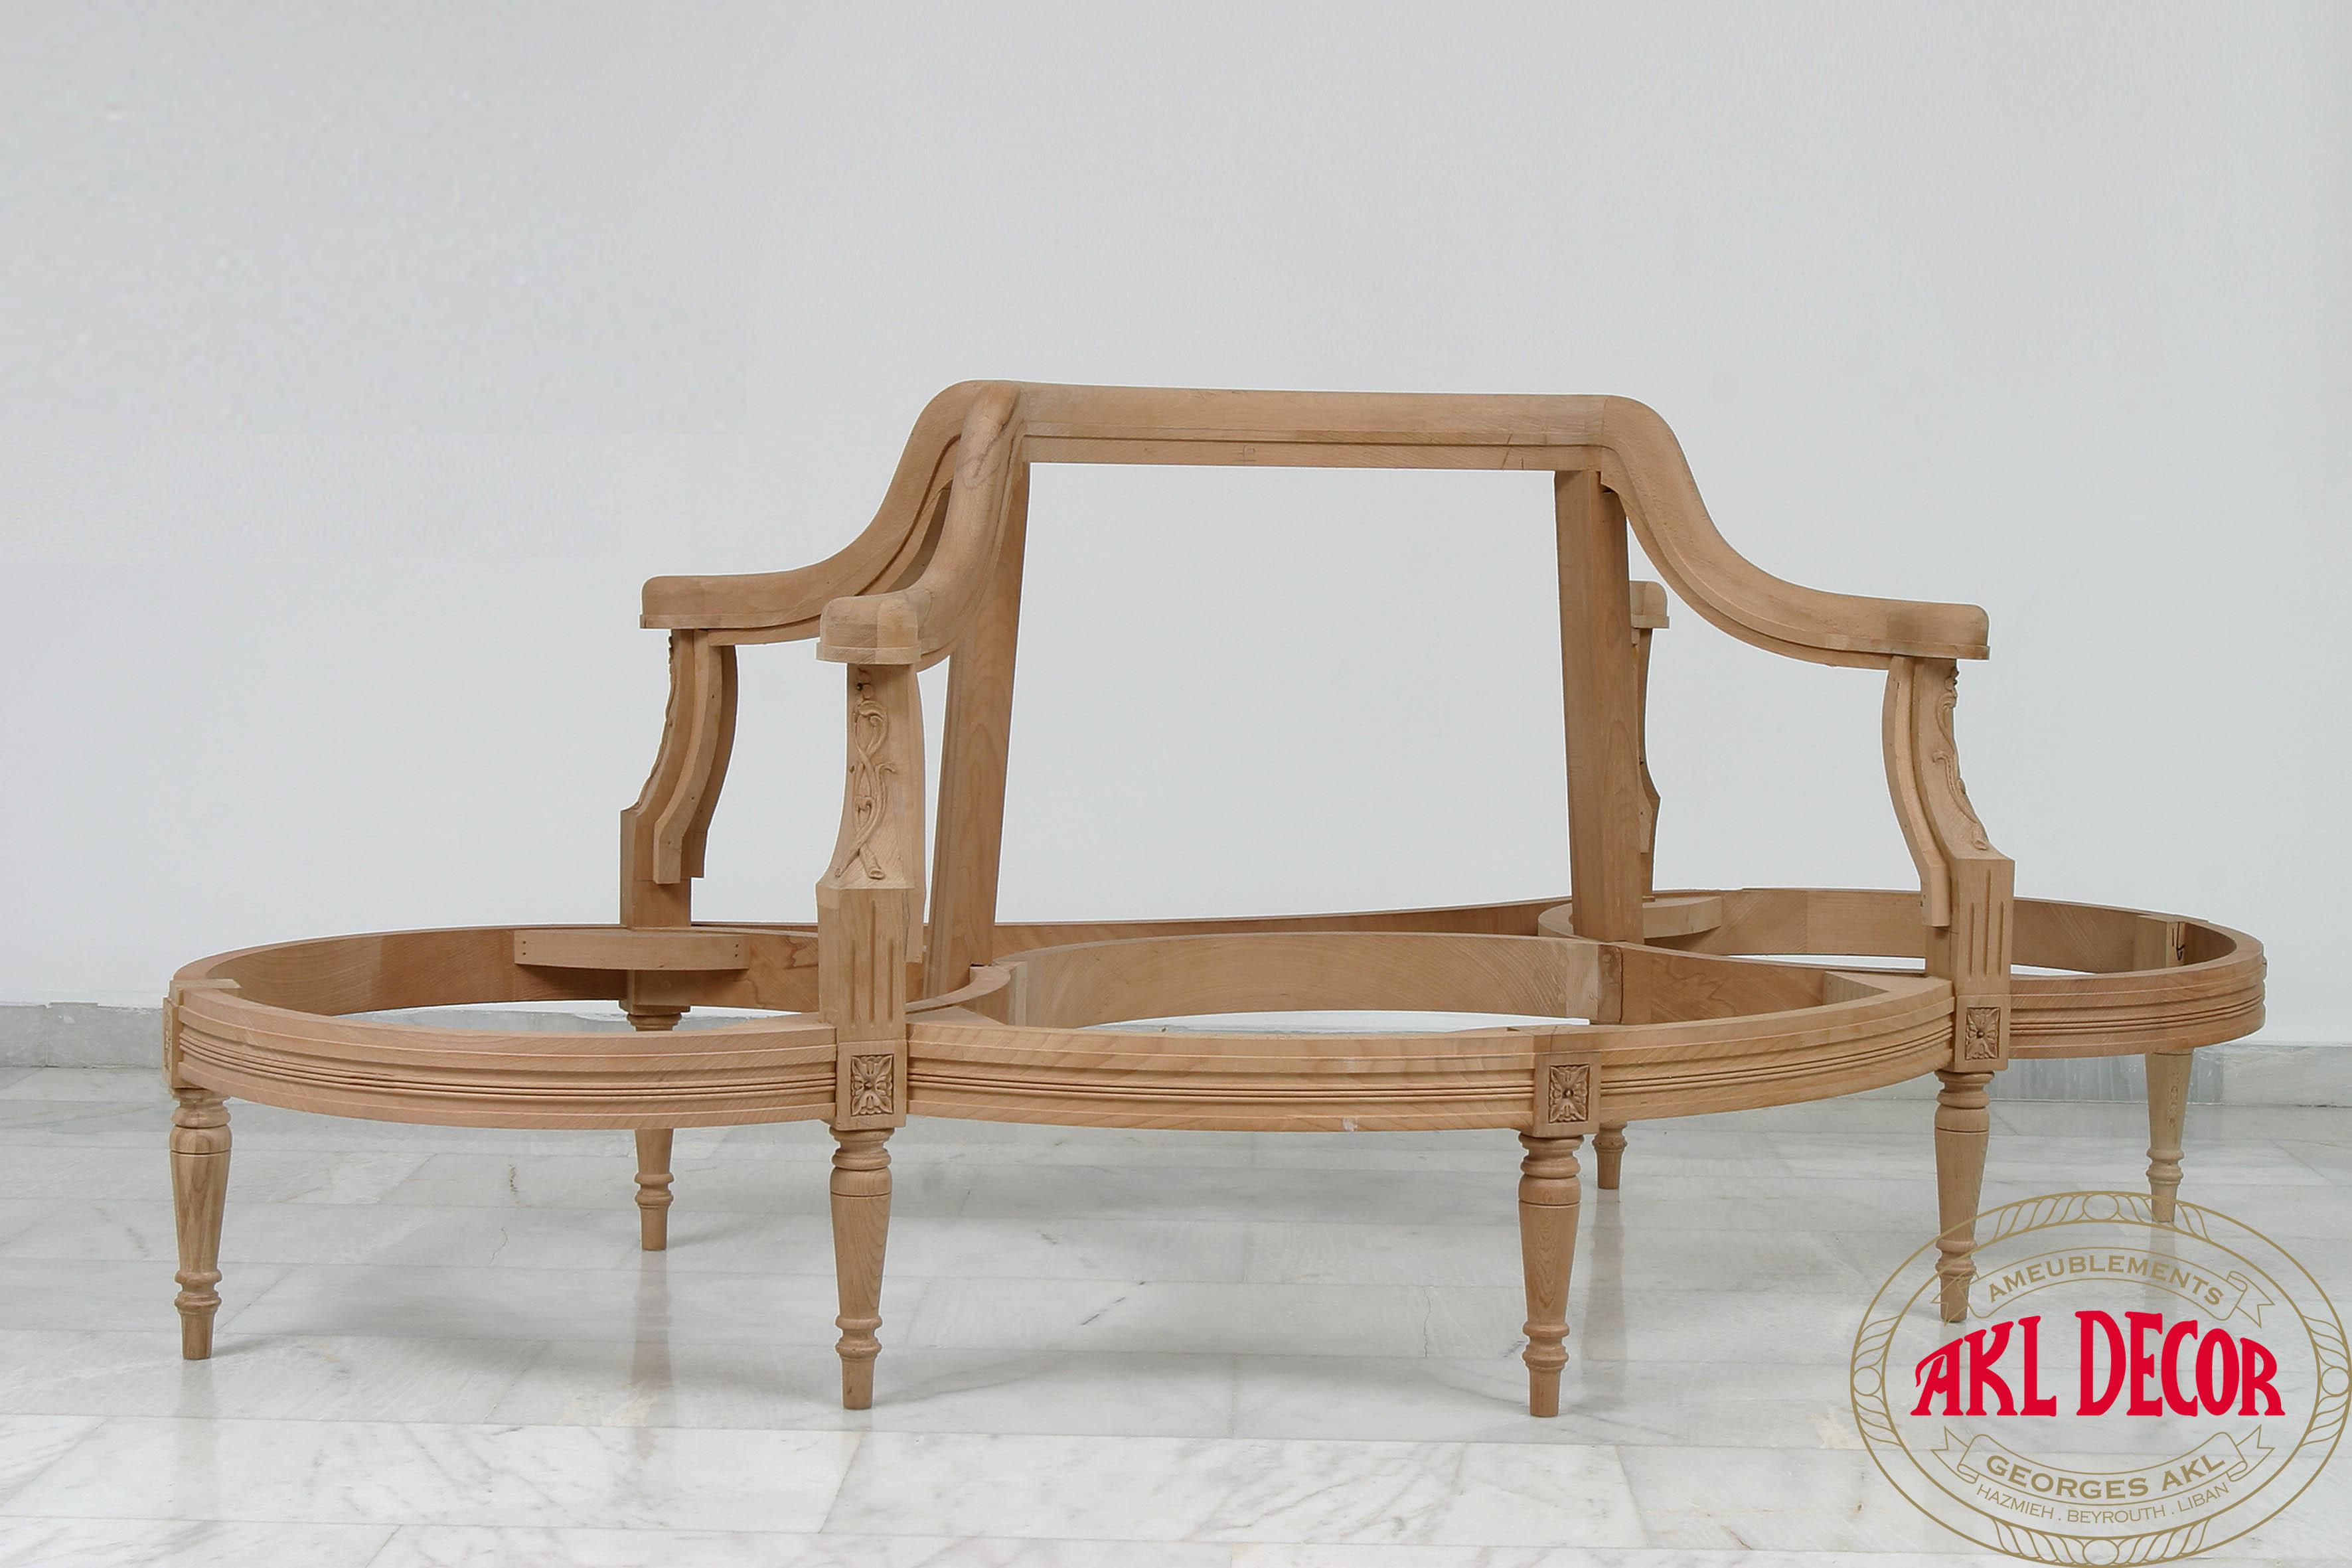 http://akldecor.com/wp-content/uploads/2018/06/furniture-production-wood-lebanon-01.jpg